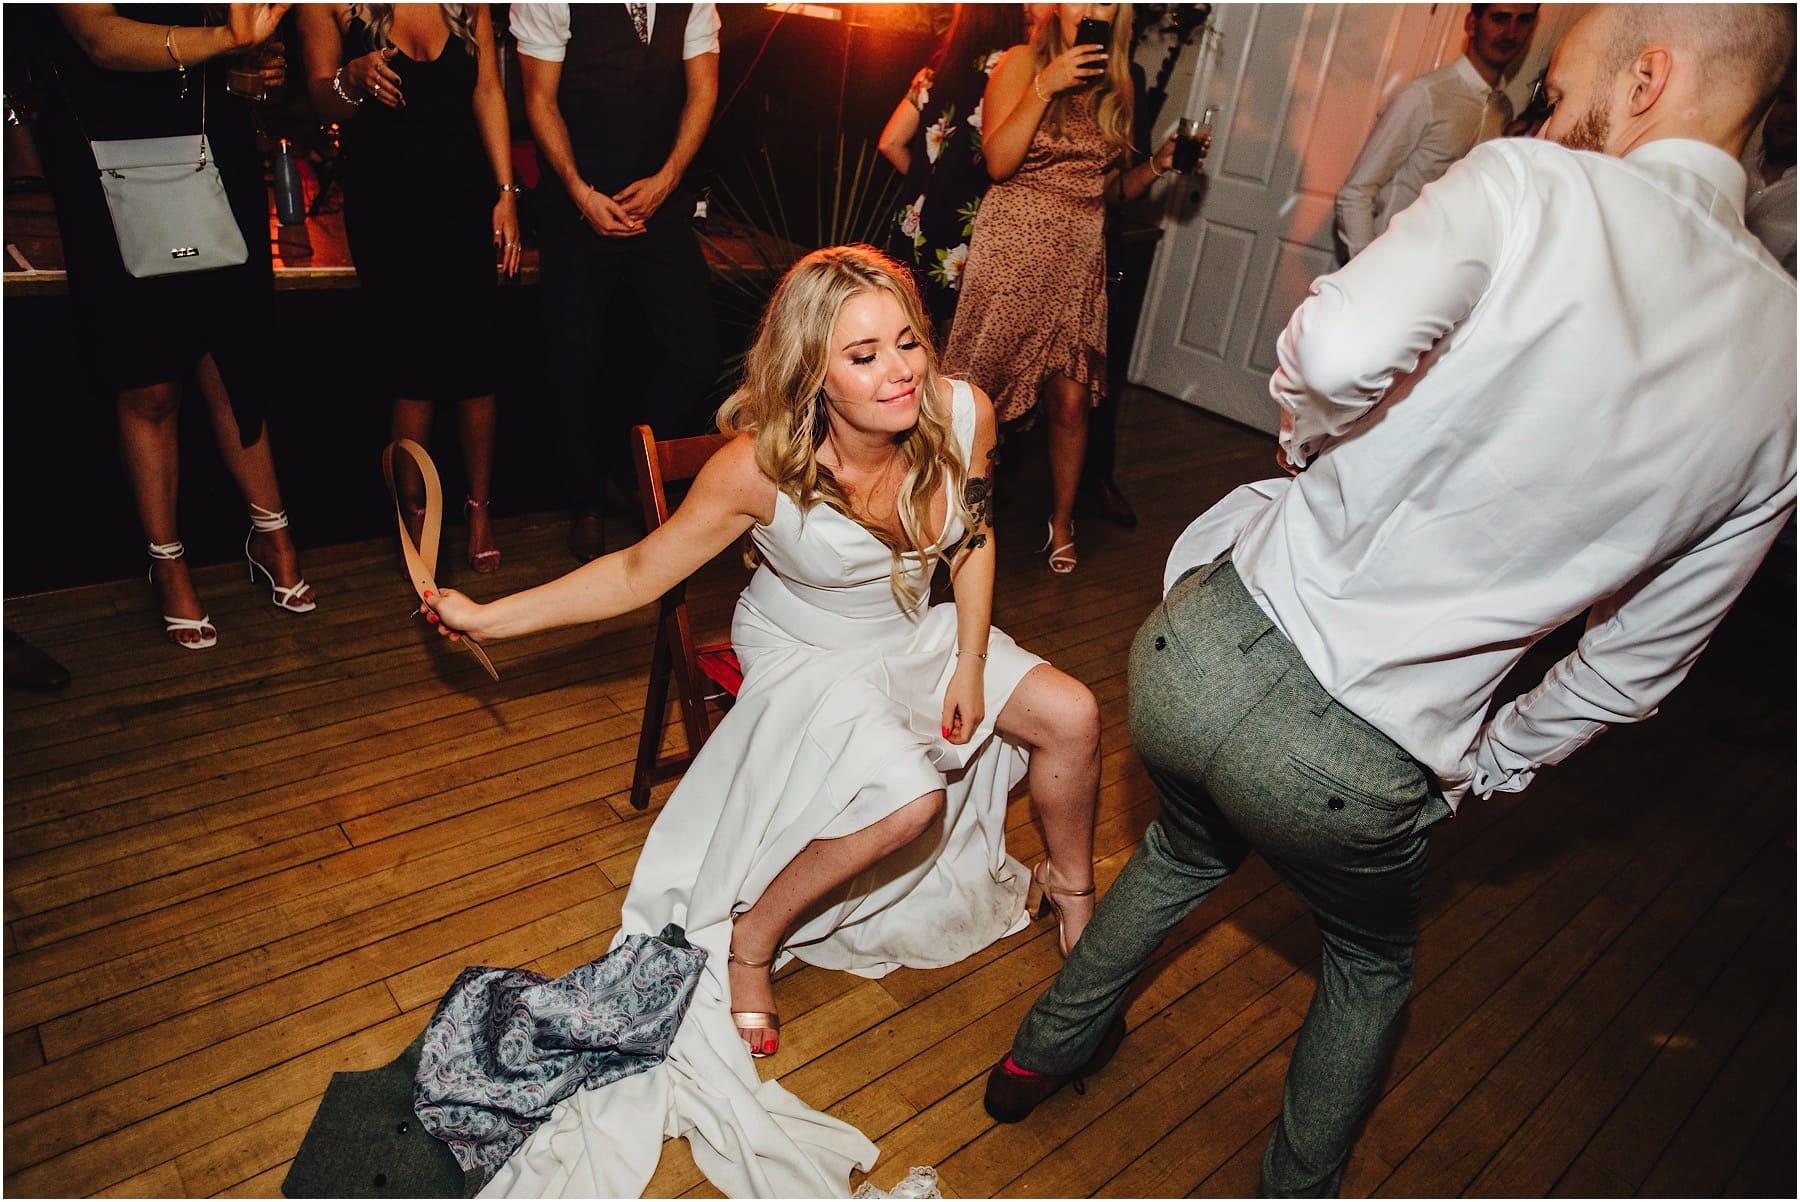 bride having fun with groom on the dance floor